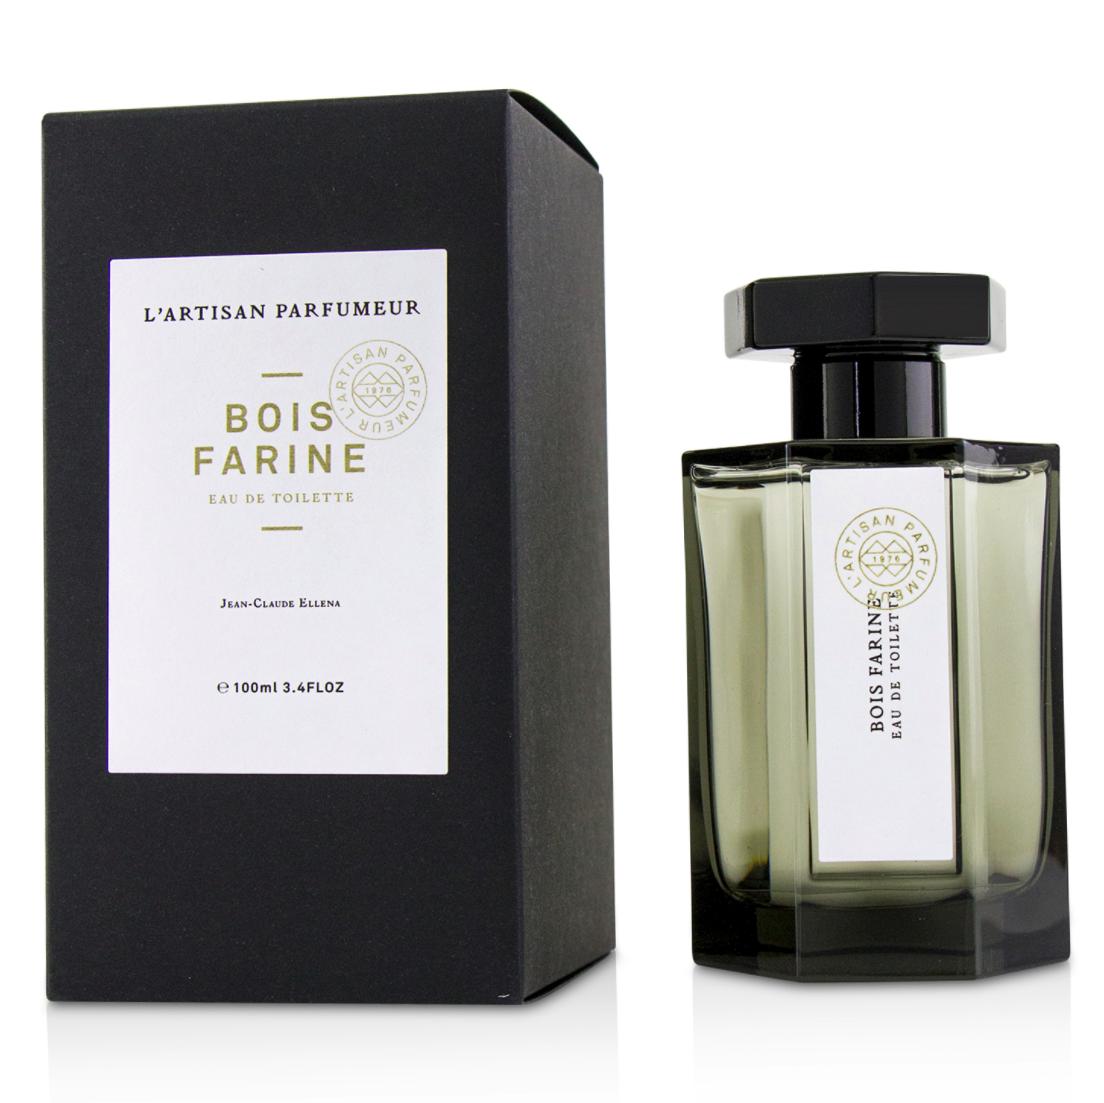 L'Artisan Parfumeur 白树森林中性淡香水 EDT 100ml